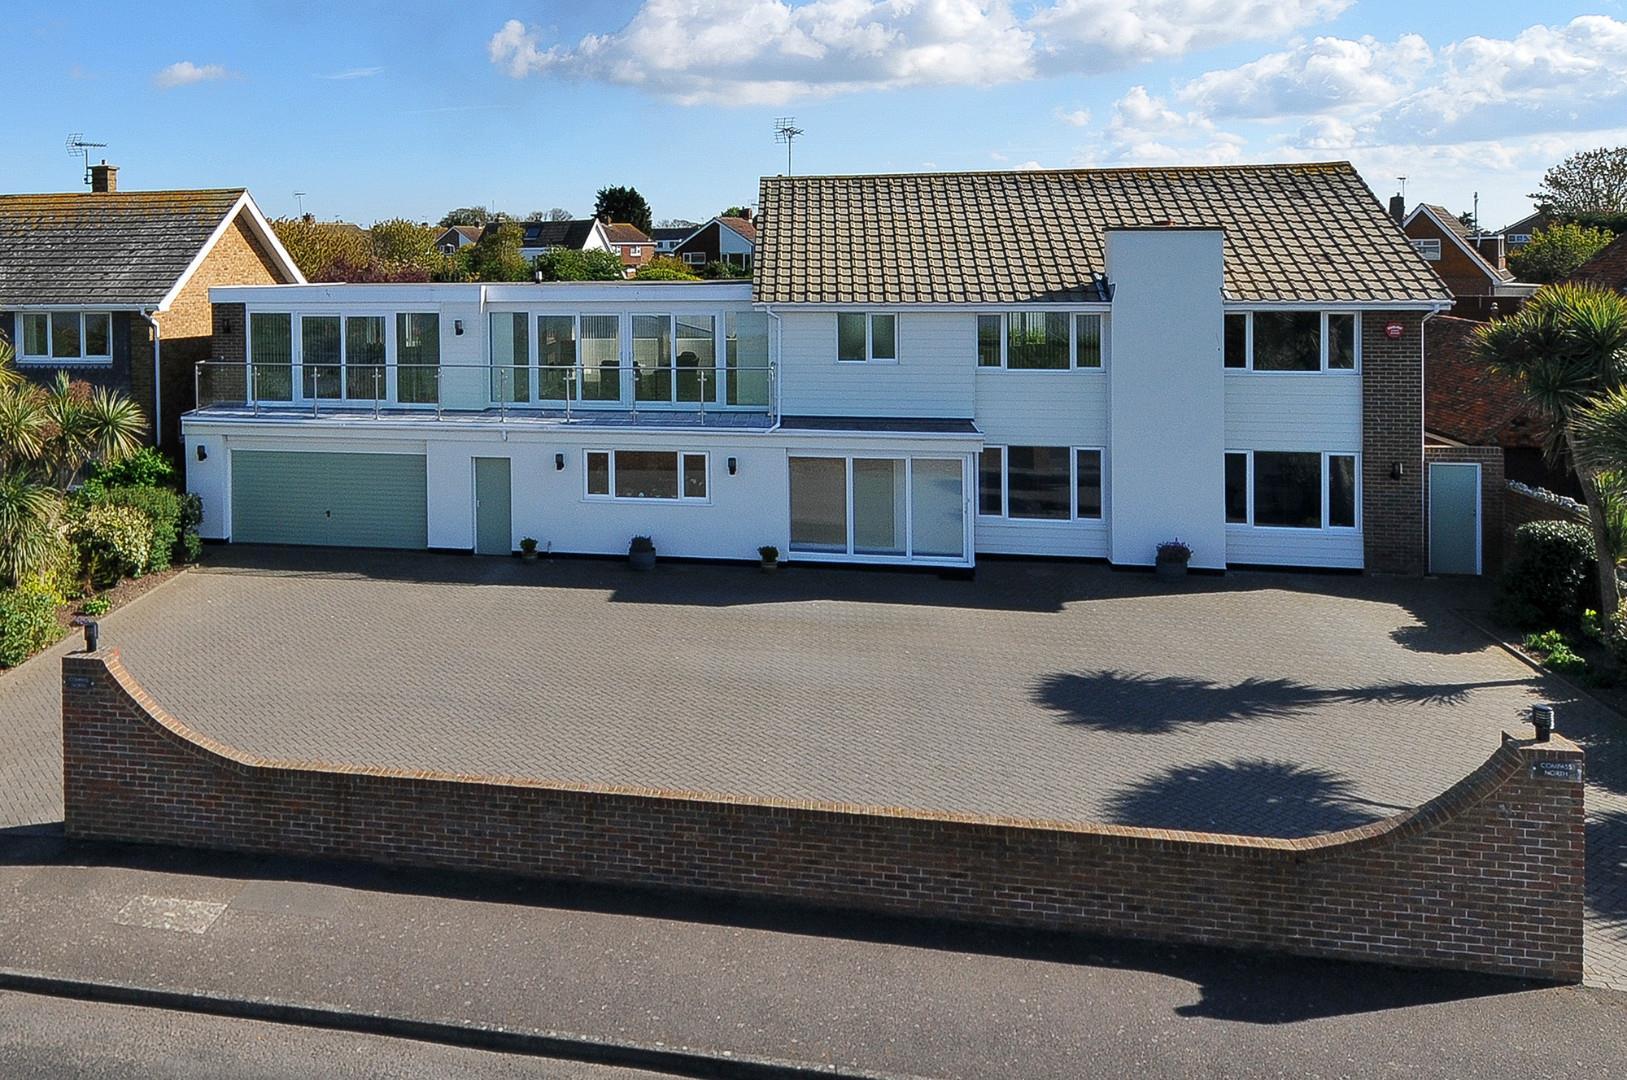 Properties For Sale Cliff Road Birchington Ct